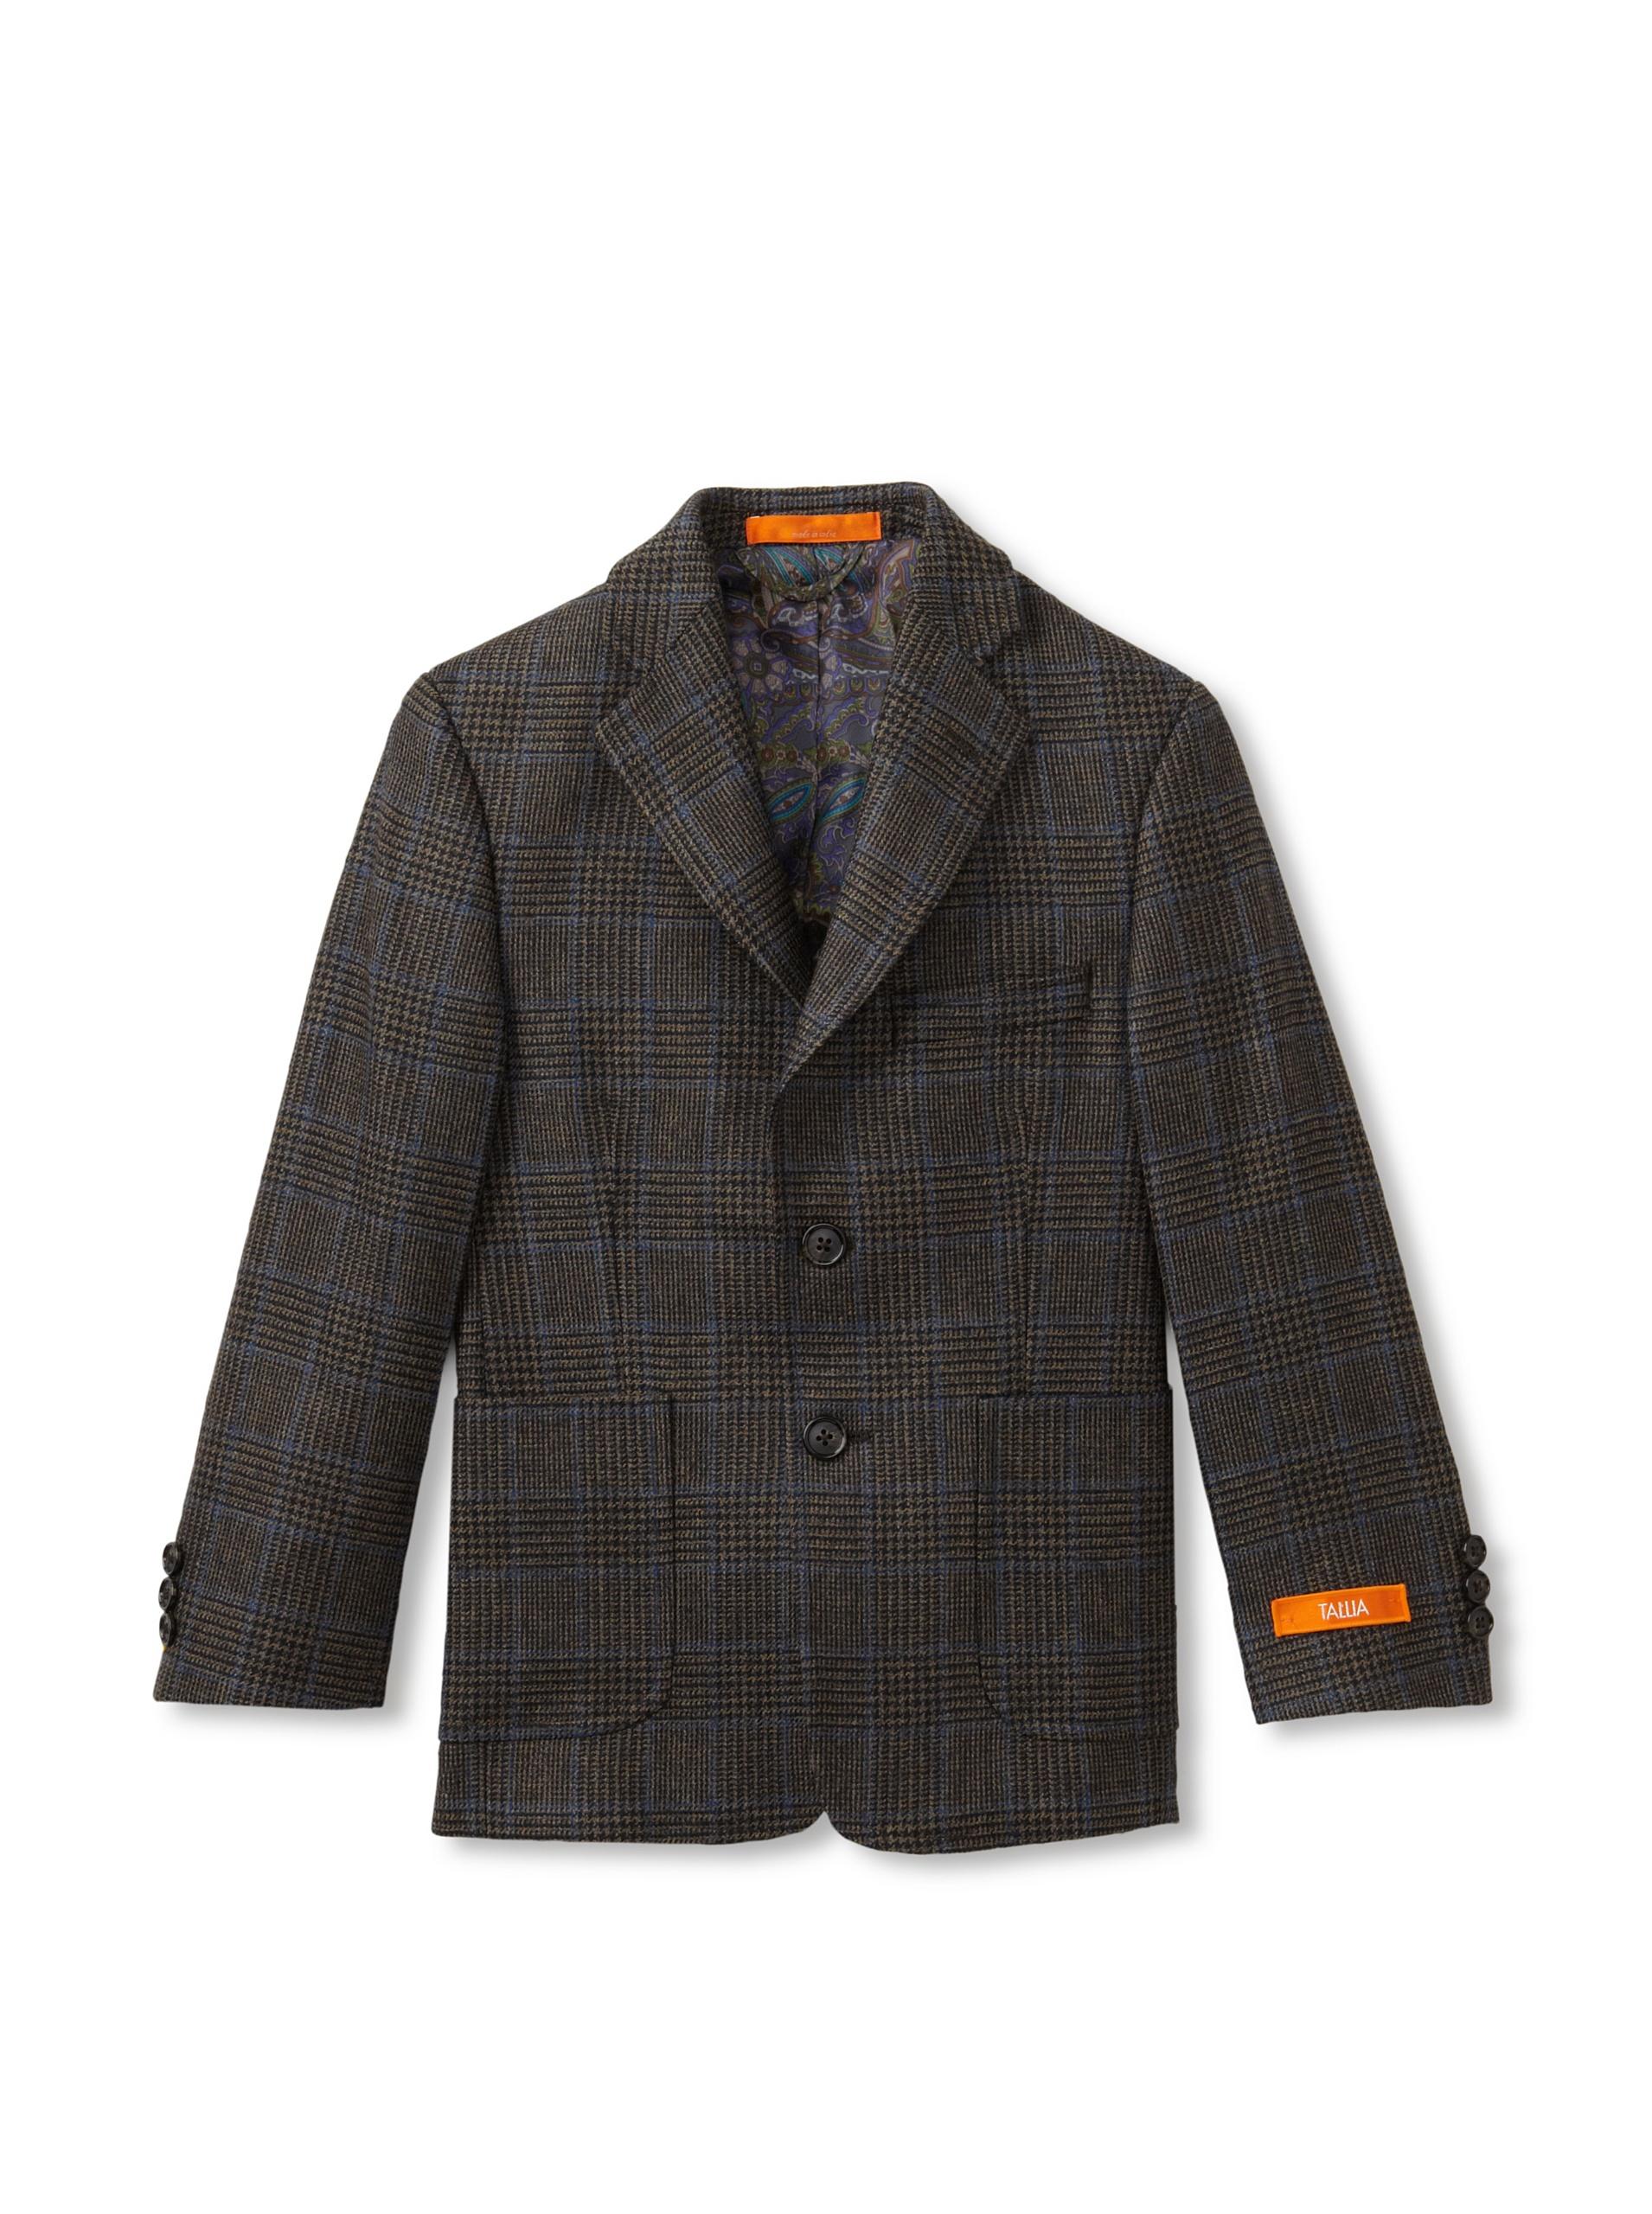 Tallia Orange Boy's Wool Sportcoat (Olive Windowpane Plaid)